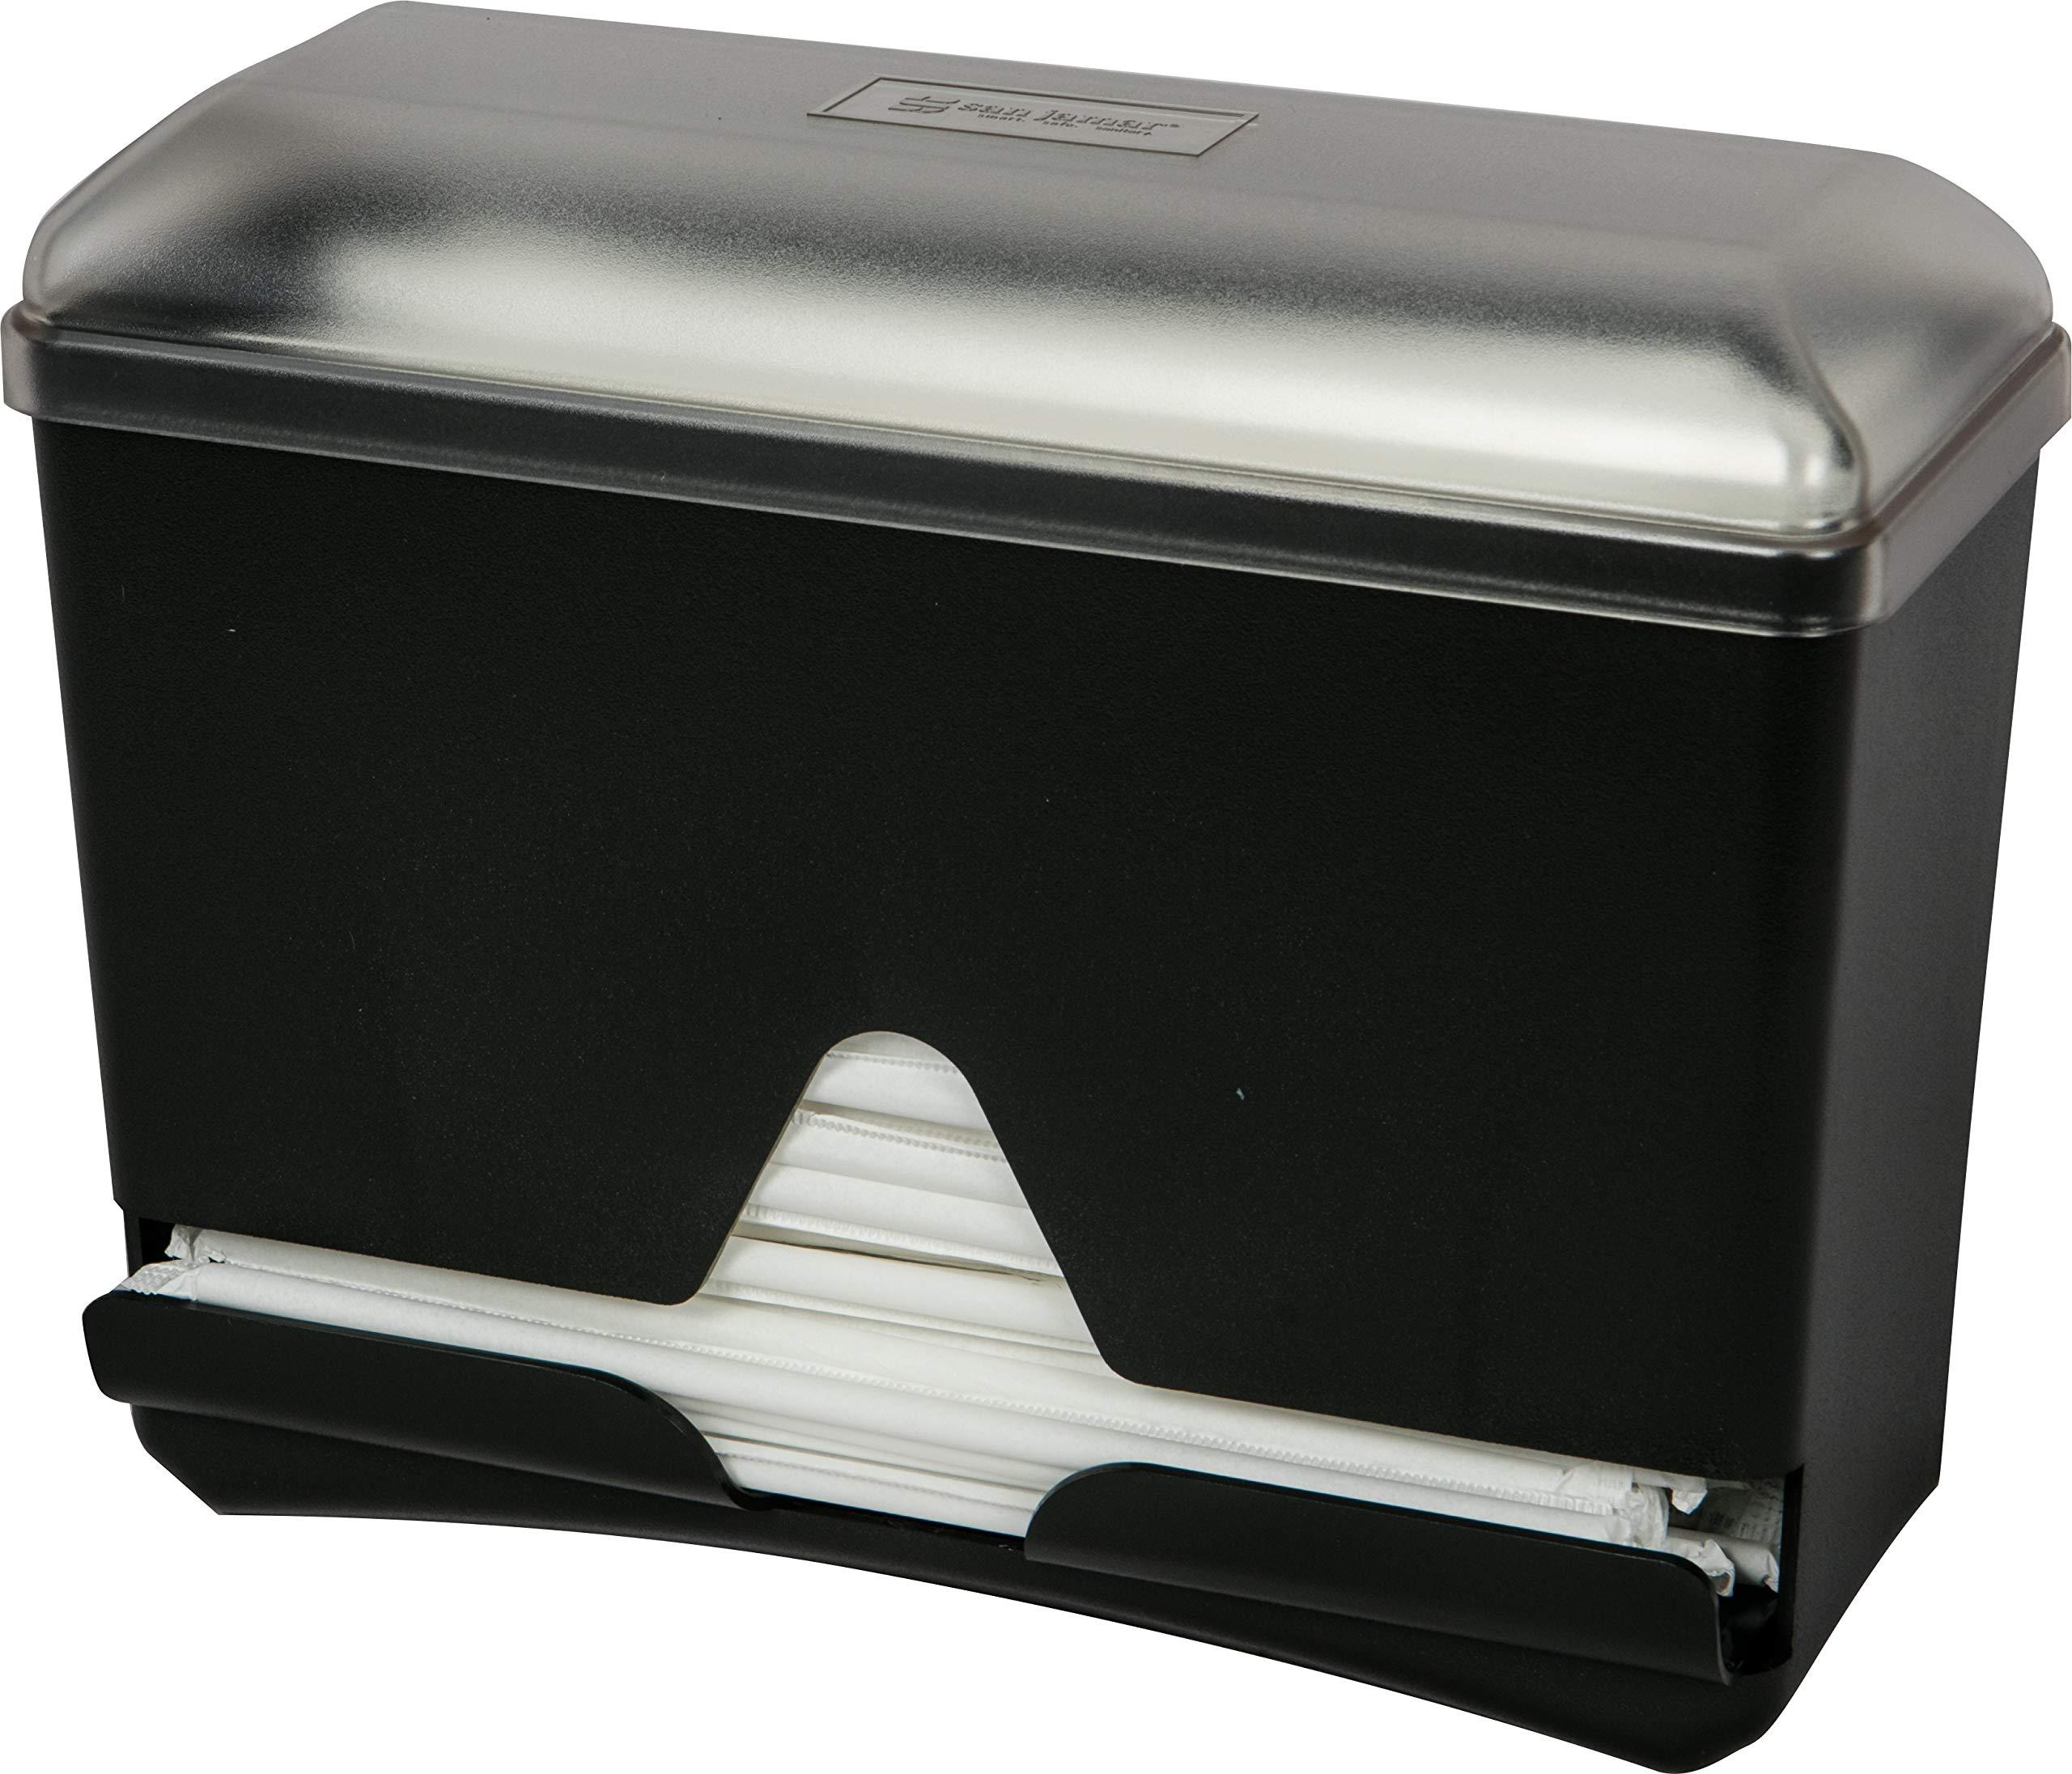 San Jamar ST250 Countertop Bulk Straw Dispenser, 250 Wrapped Straw Capacity, Black by San Jamar